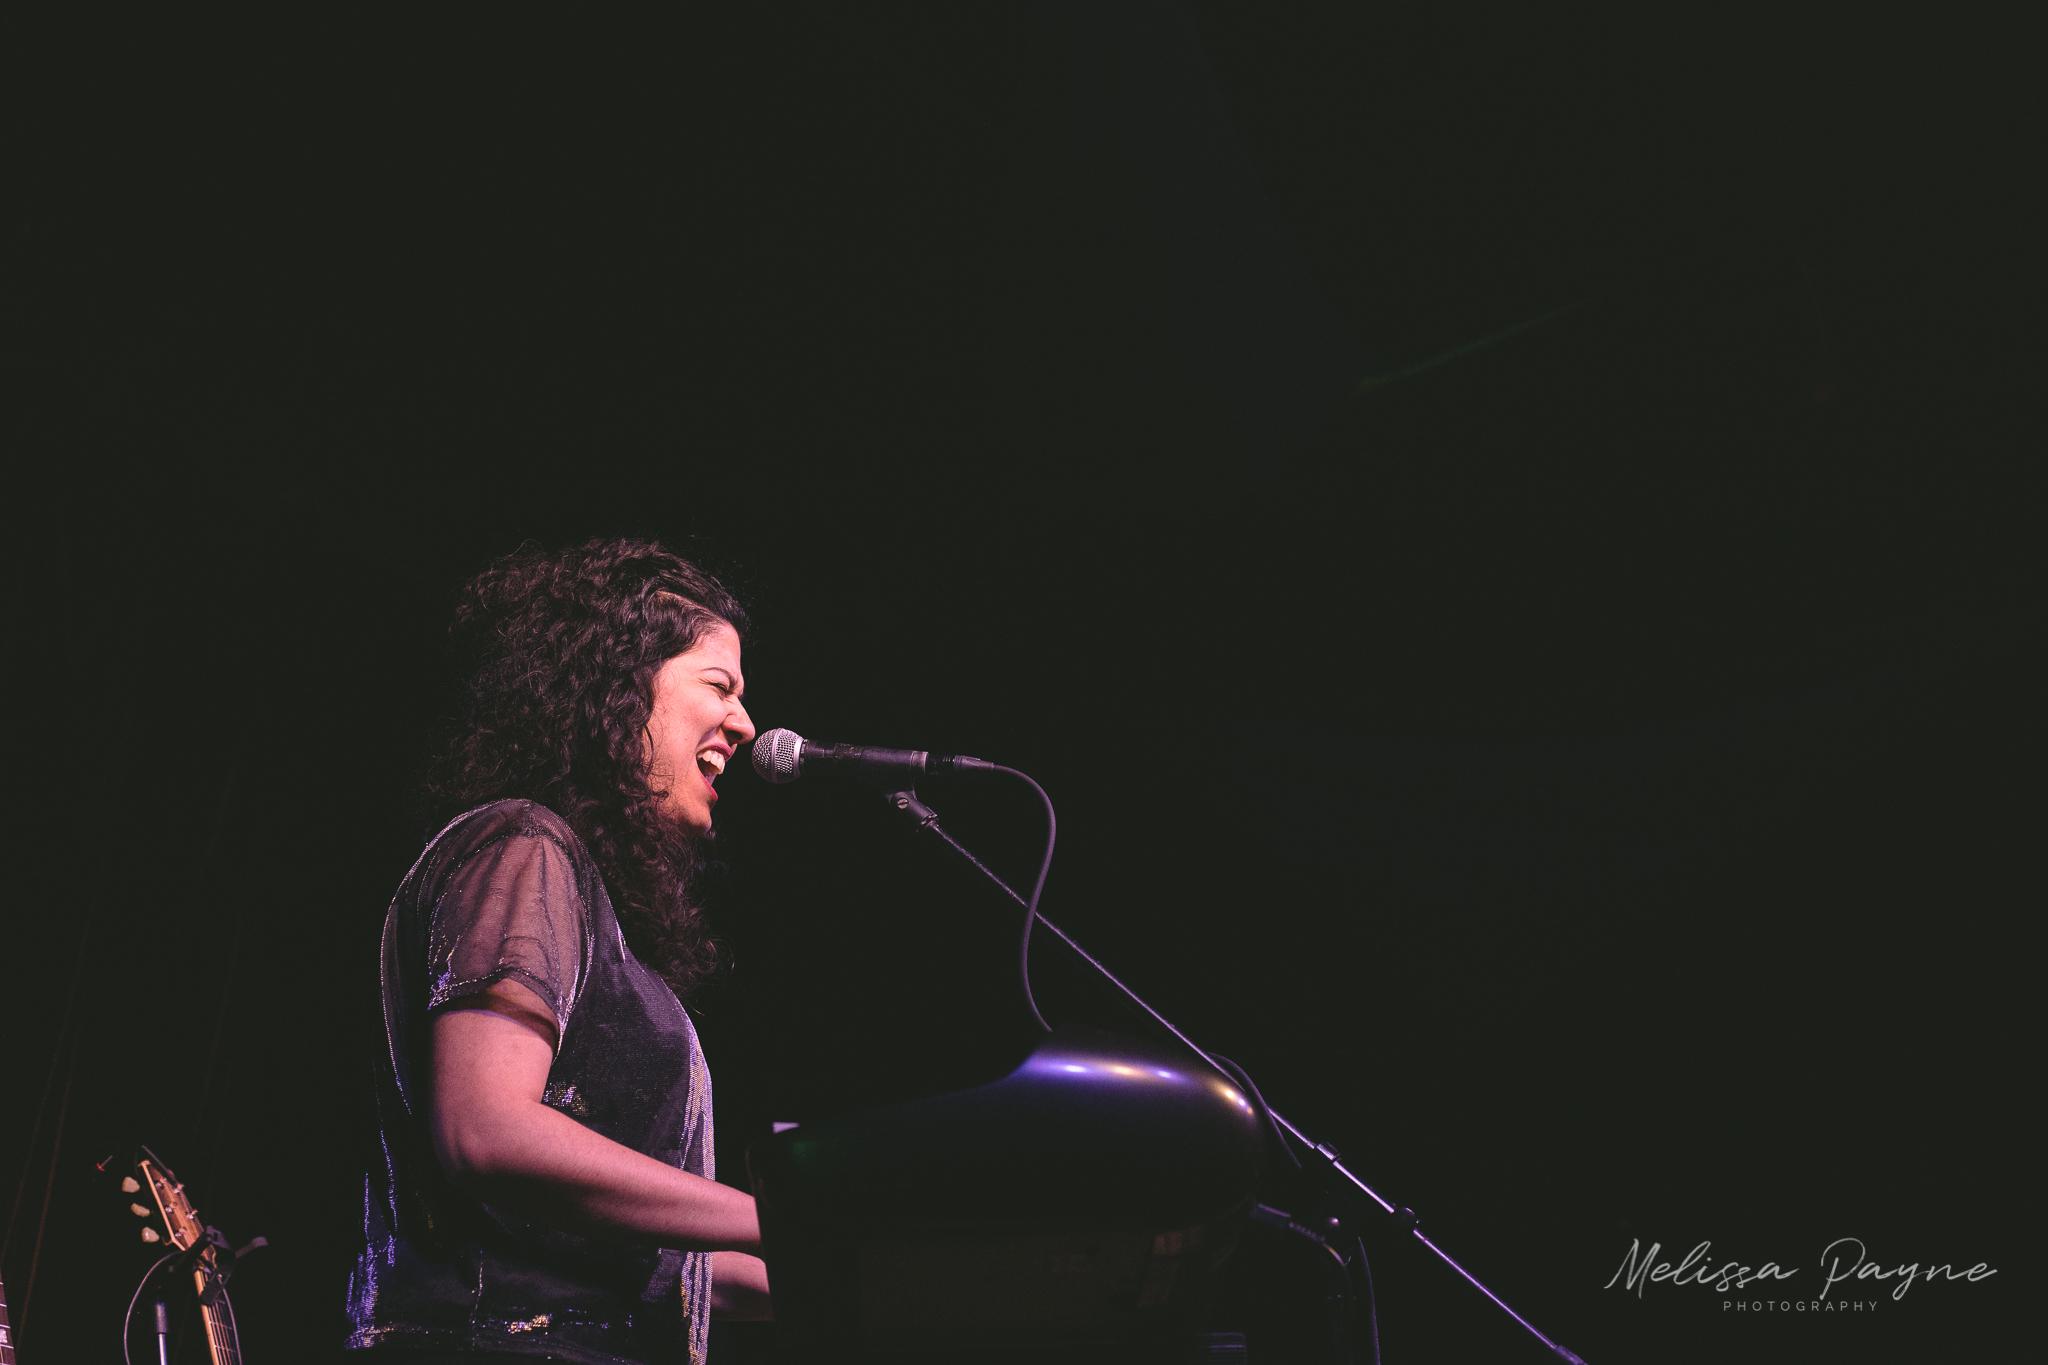 Casii Stephan and The Midnight Sun | The Oklahoma Reviews